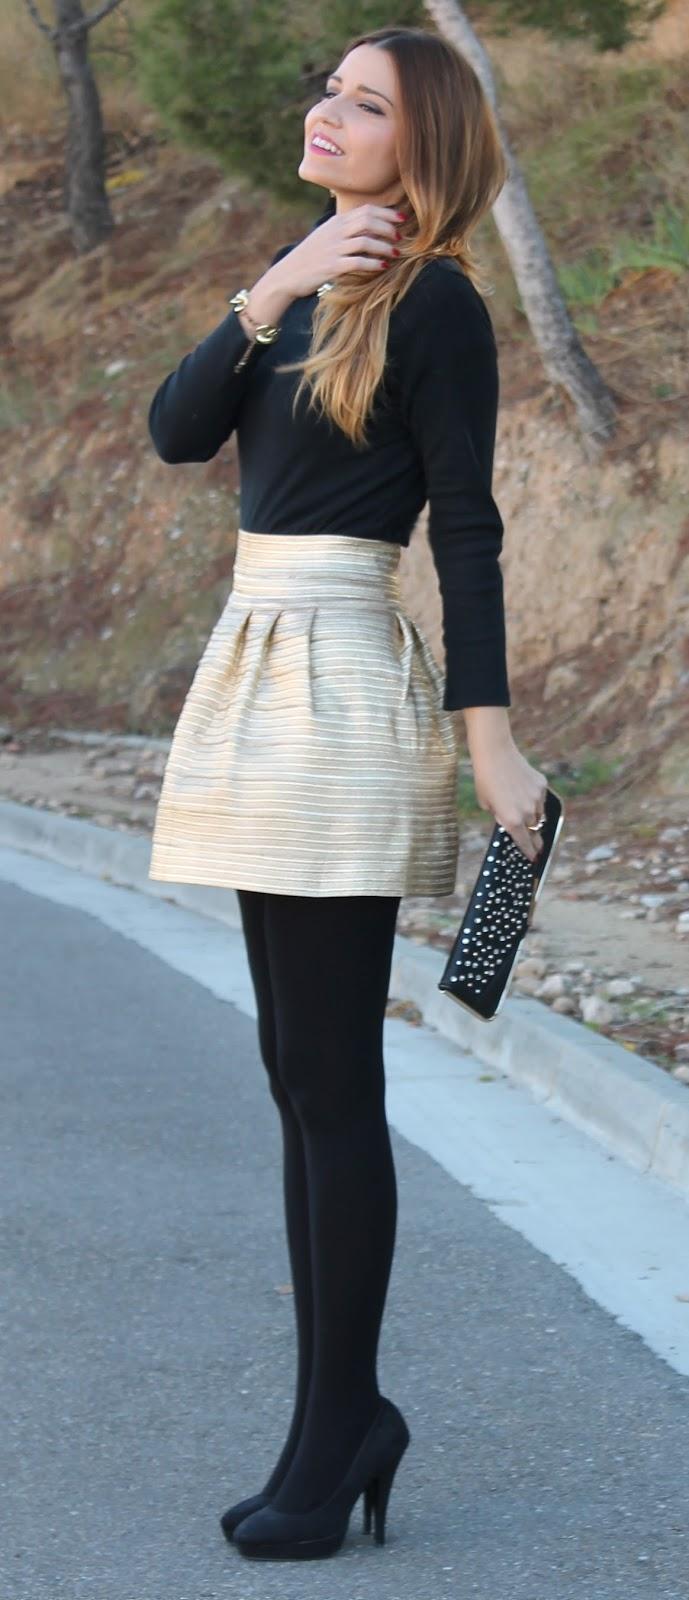 trendy outfit idea : black top + skirt + heels + heels